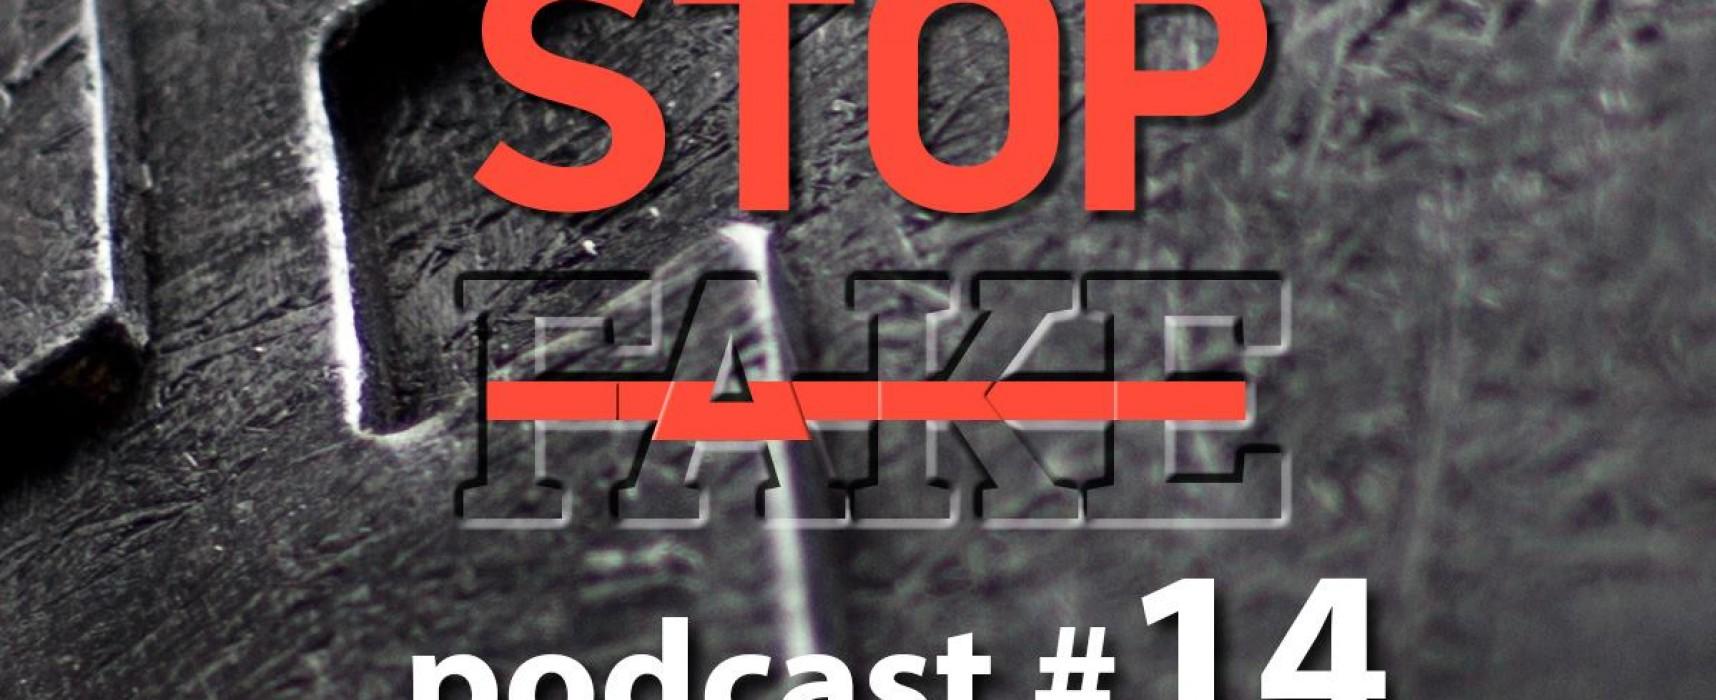 StopFake podcast #14